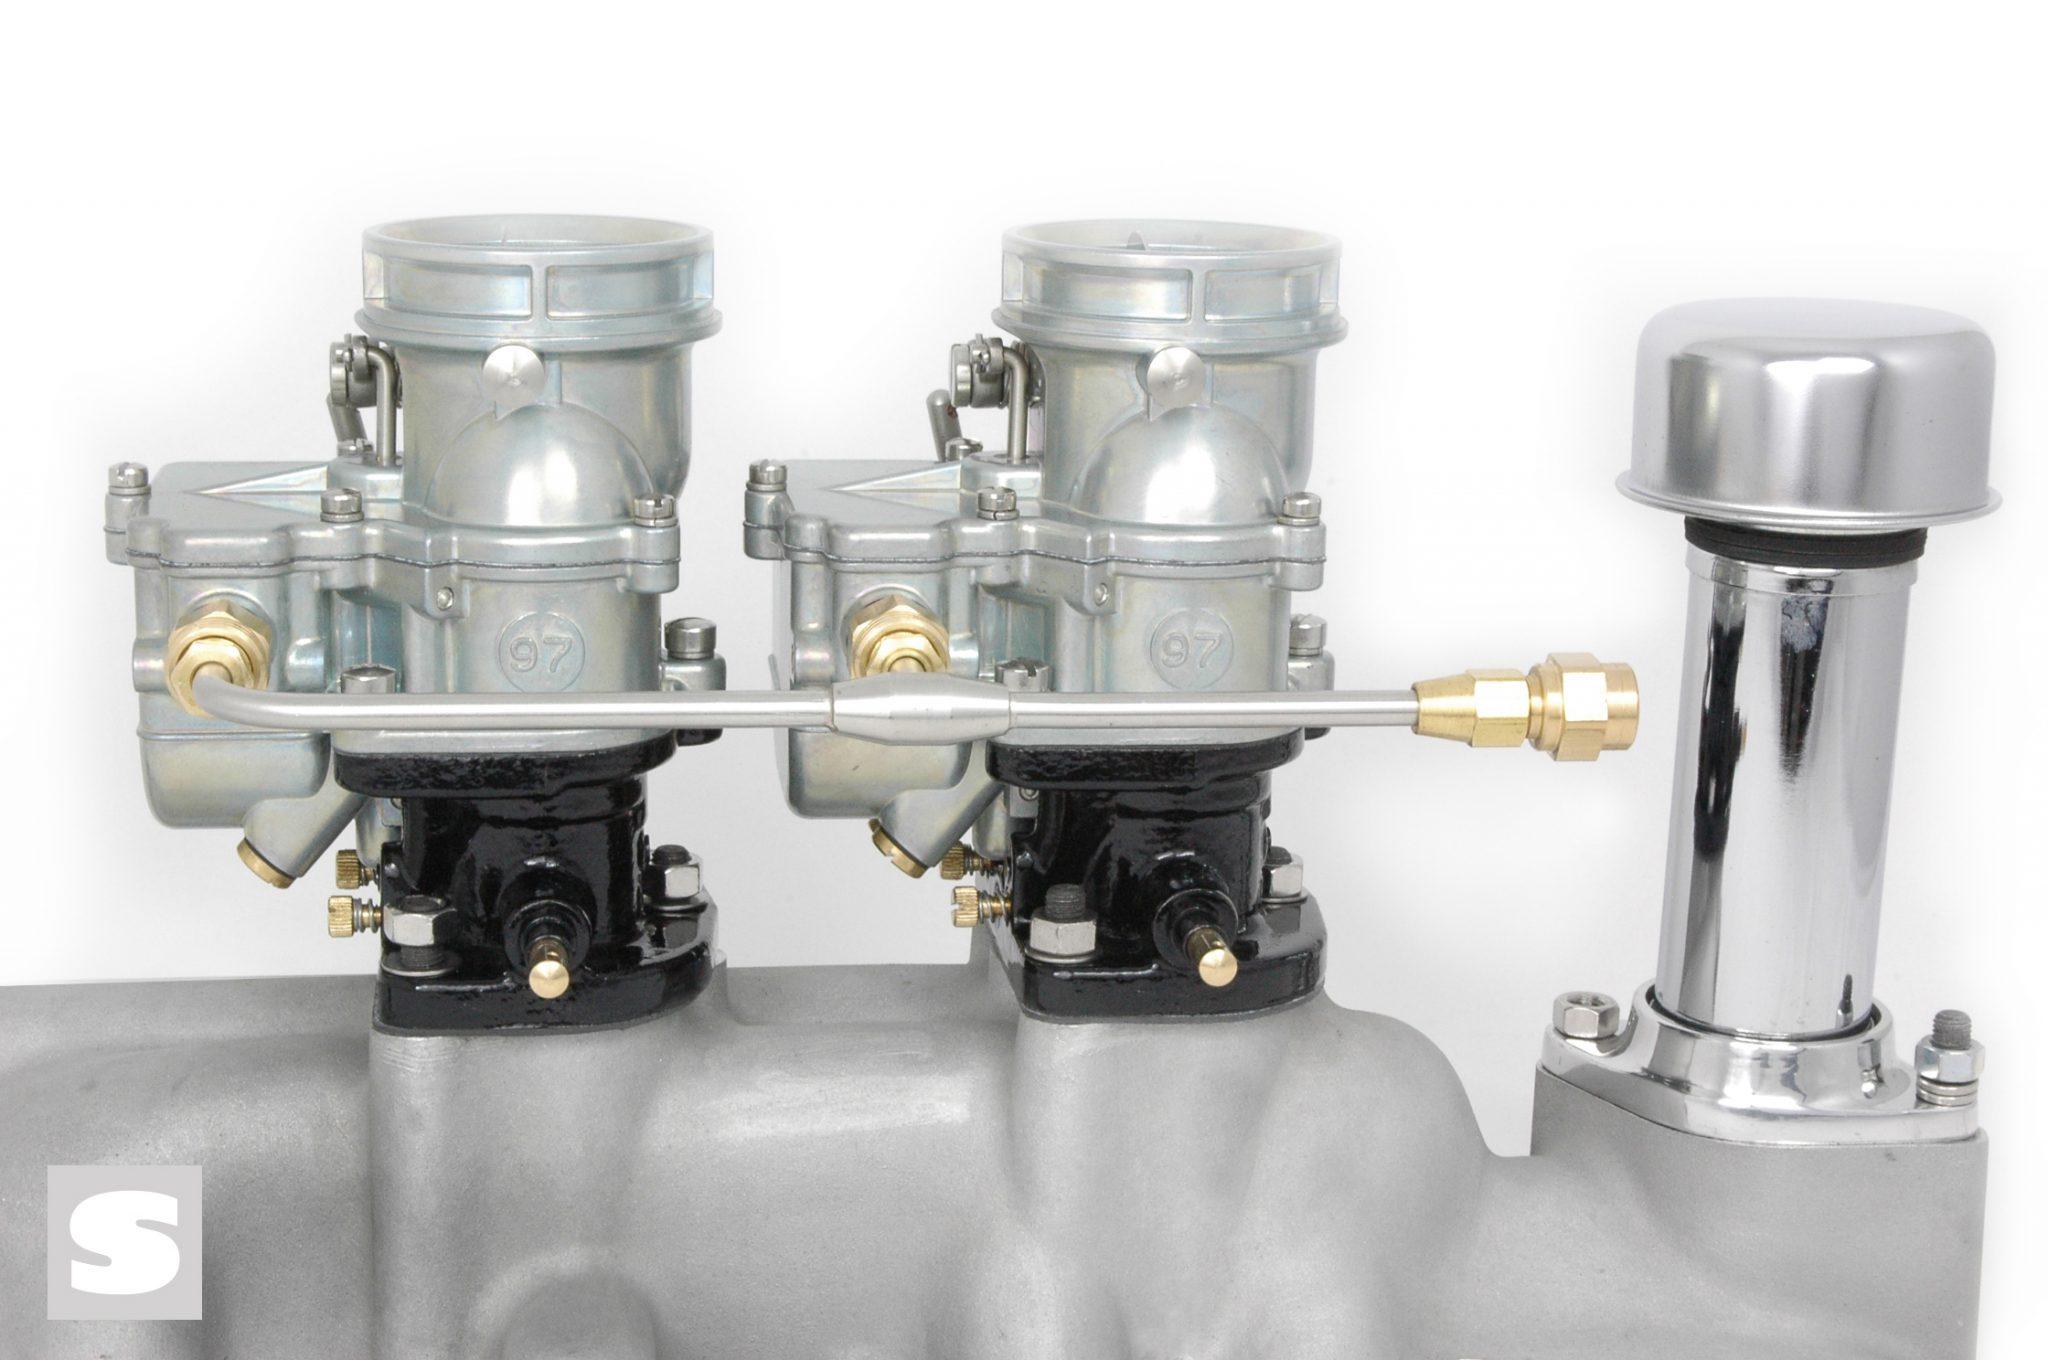 Fuel Line 2x2 - remote pump STROMBERG 9141-RP